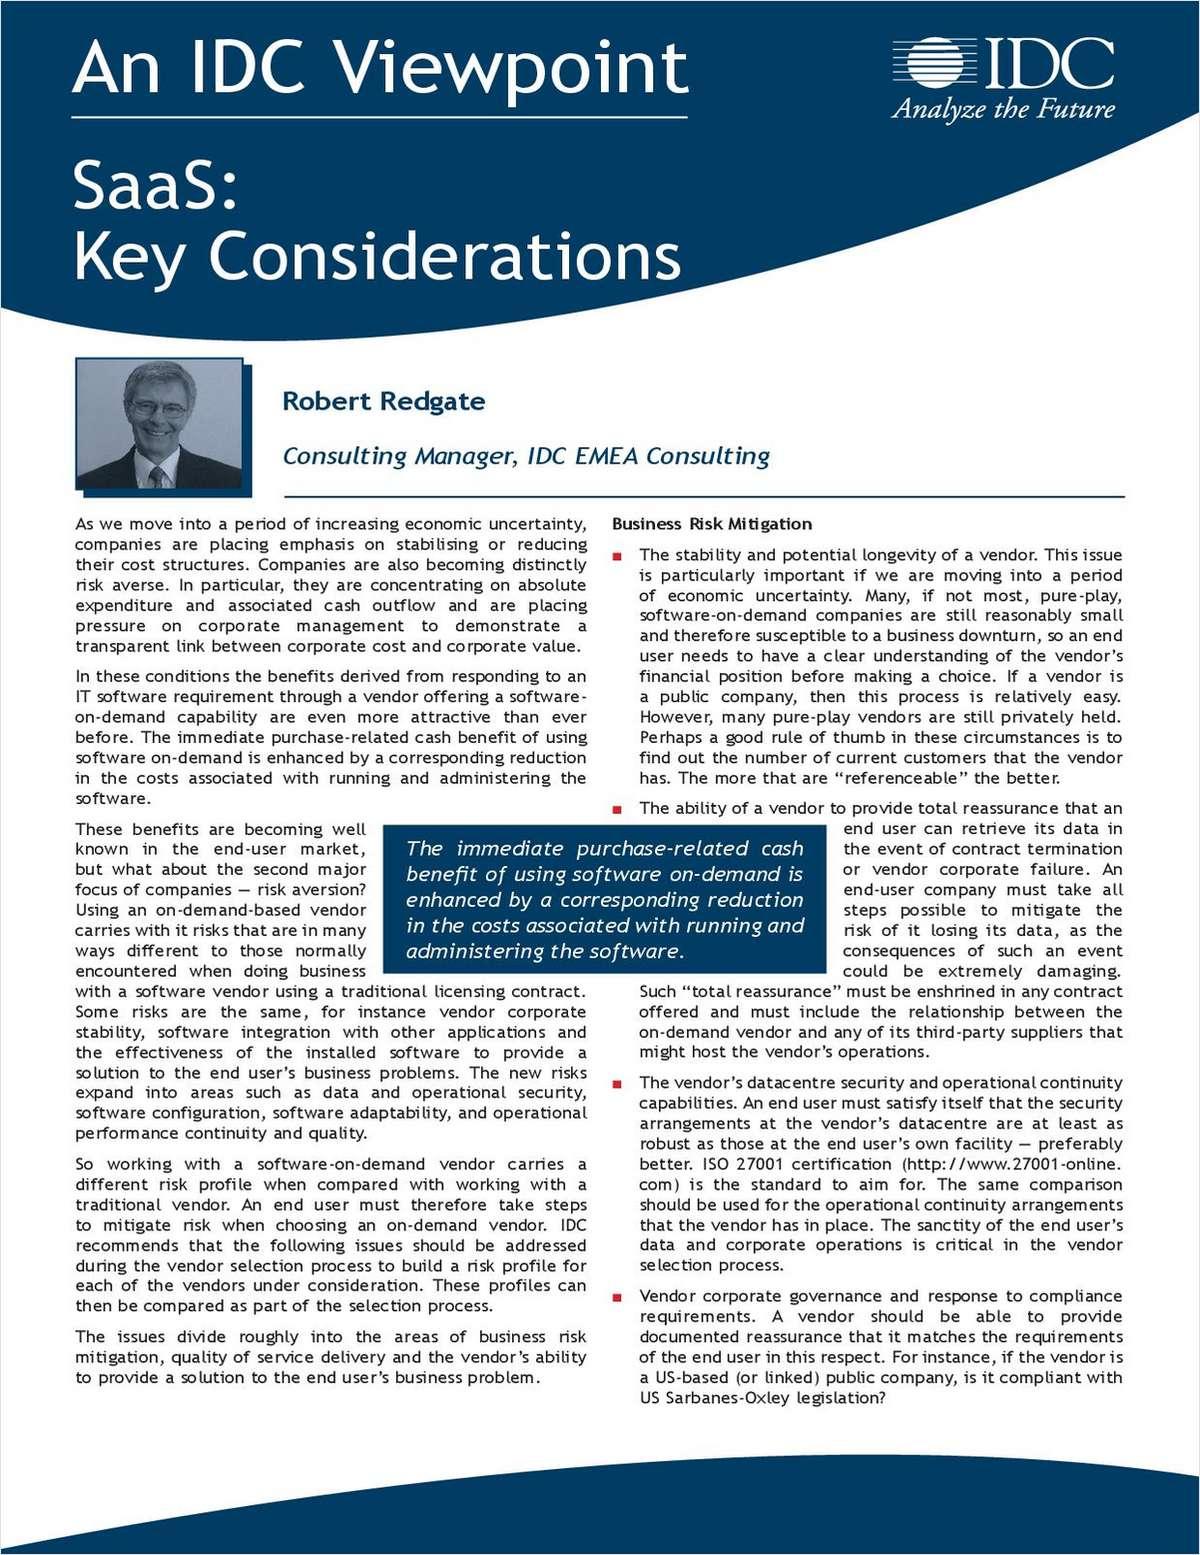 IDC Viewpoint - SaaS: Key Considerations